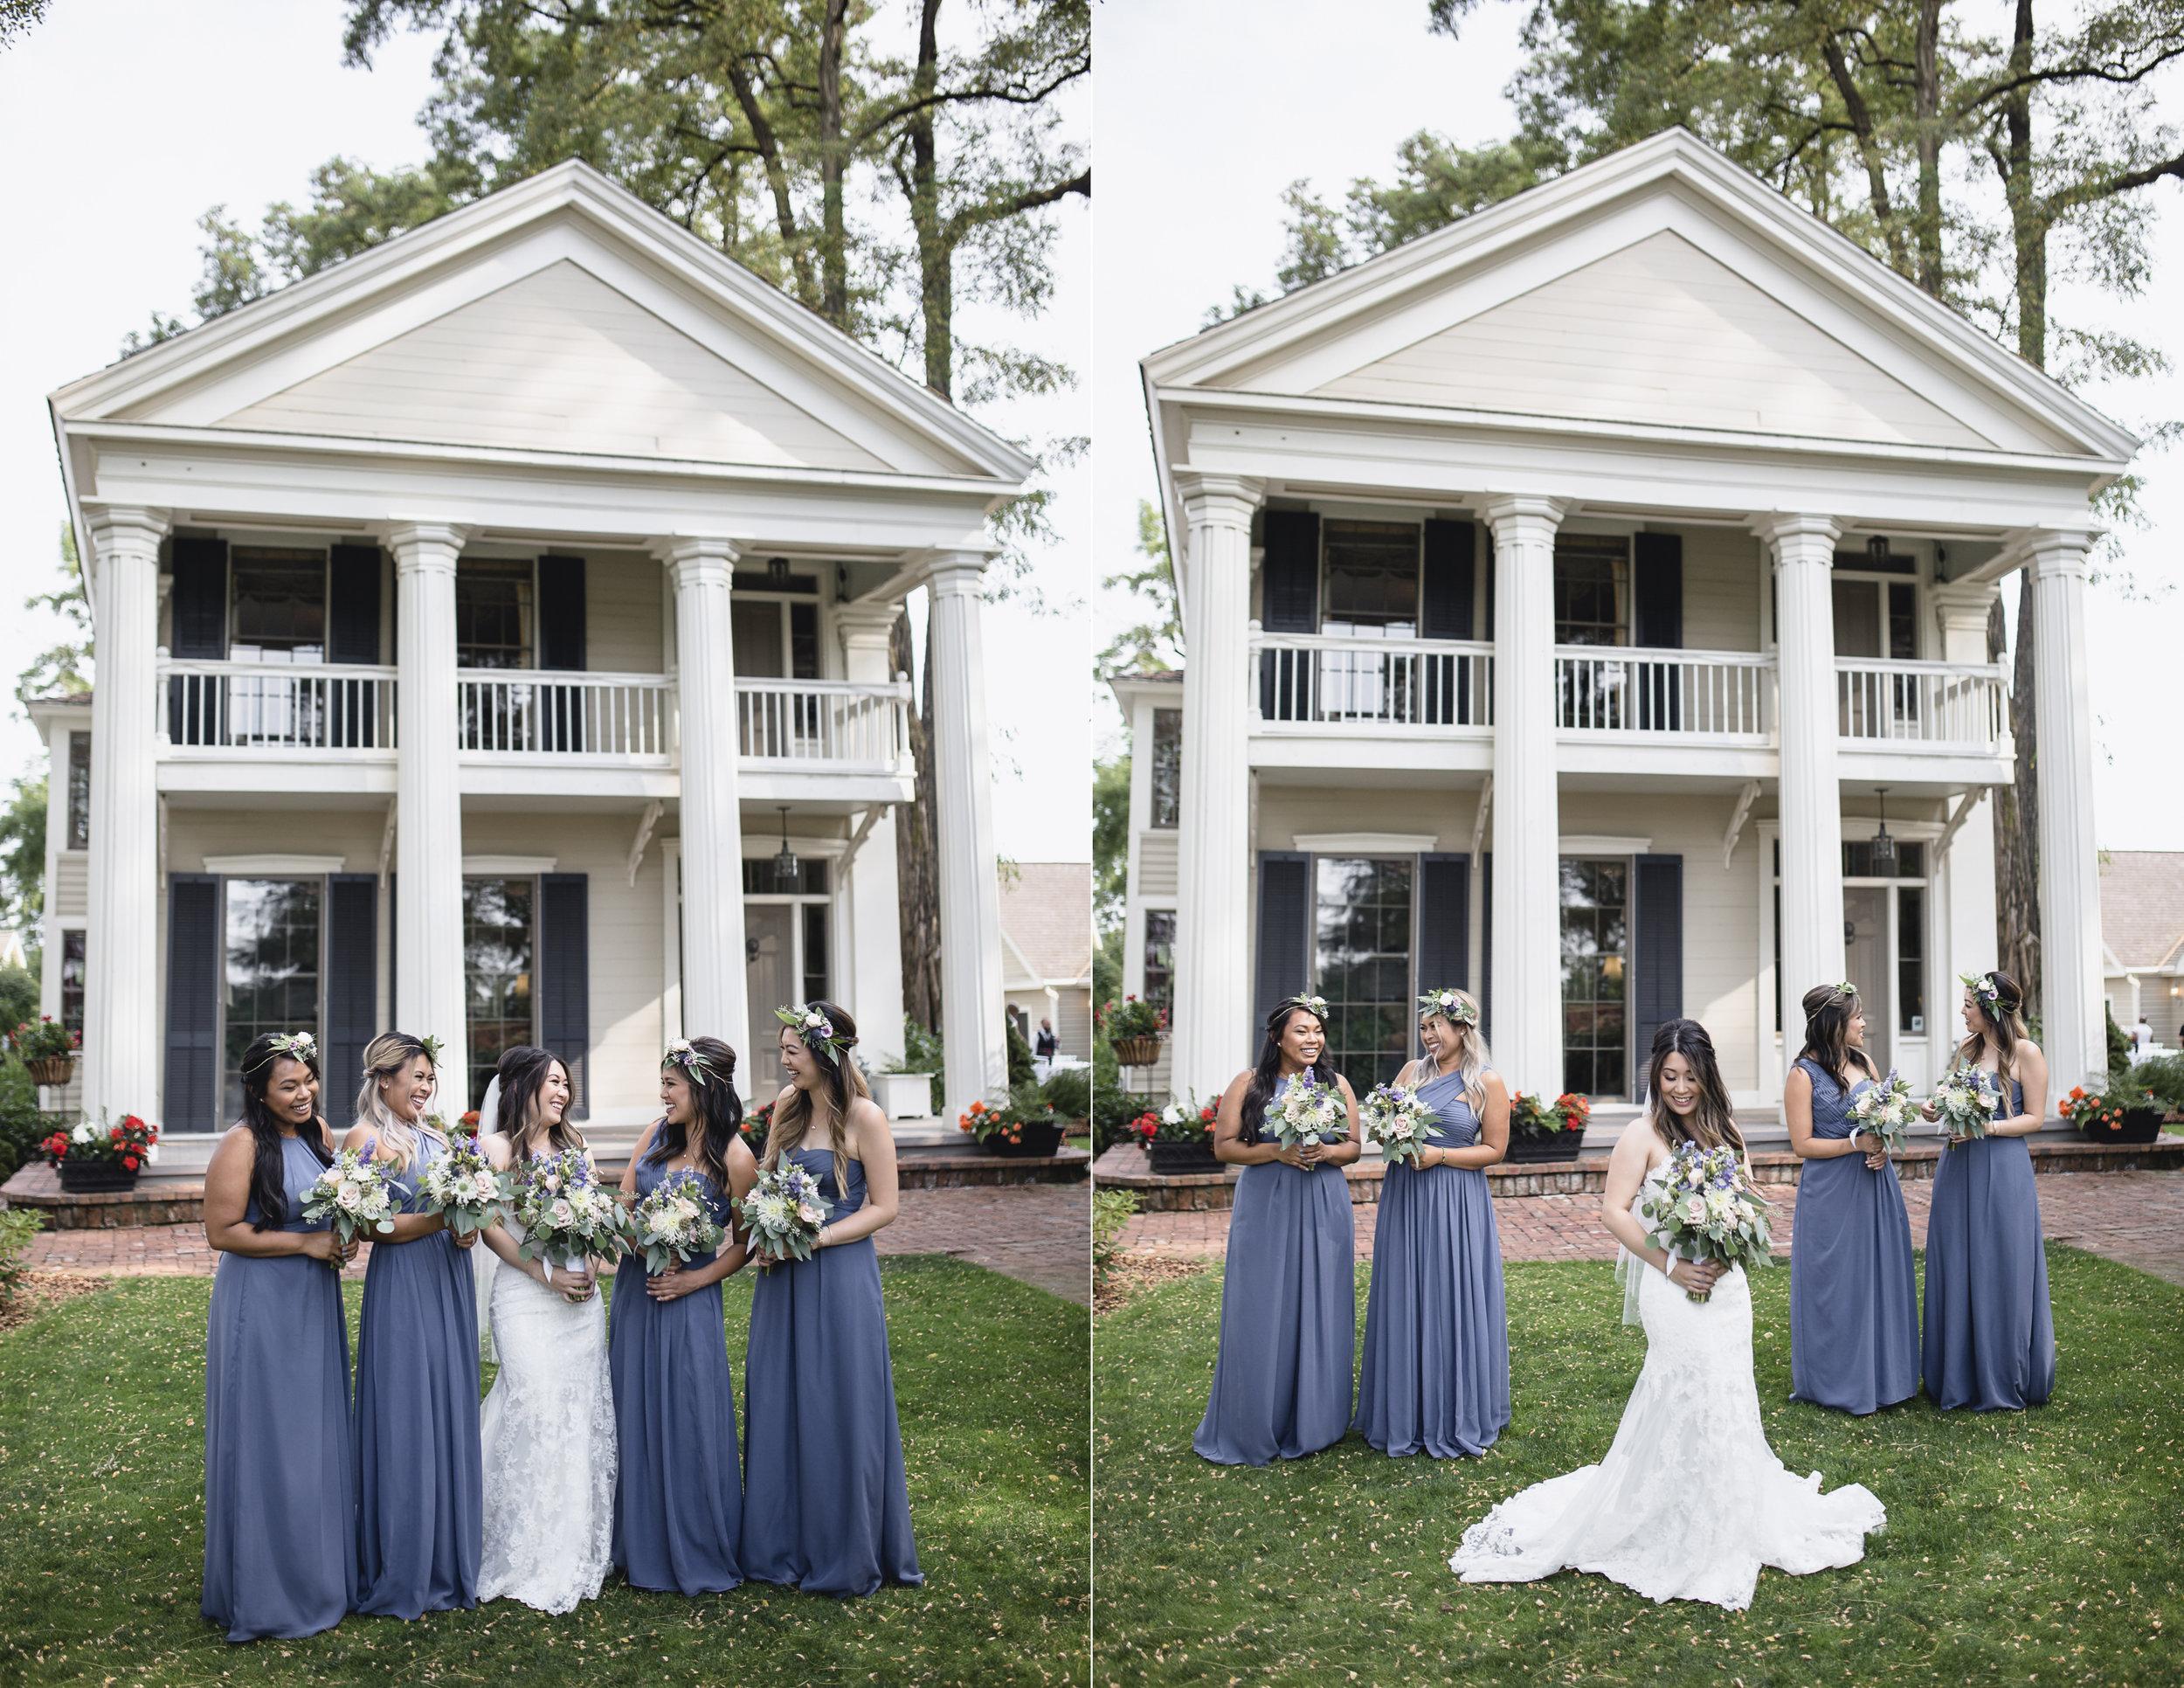 Ainsworth house wedding venue oregon city portland oregon photographer maccoy dean fine art 9.jpg